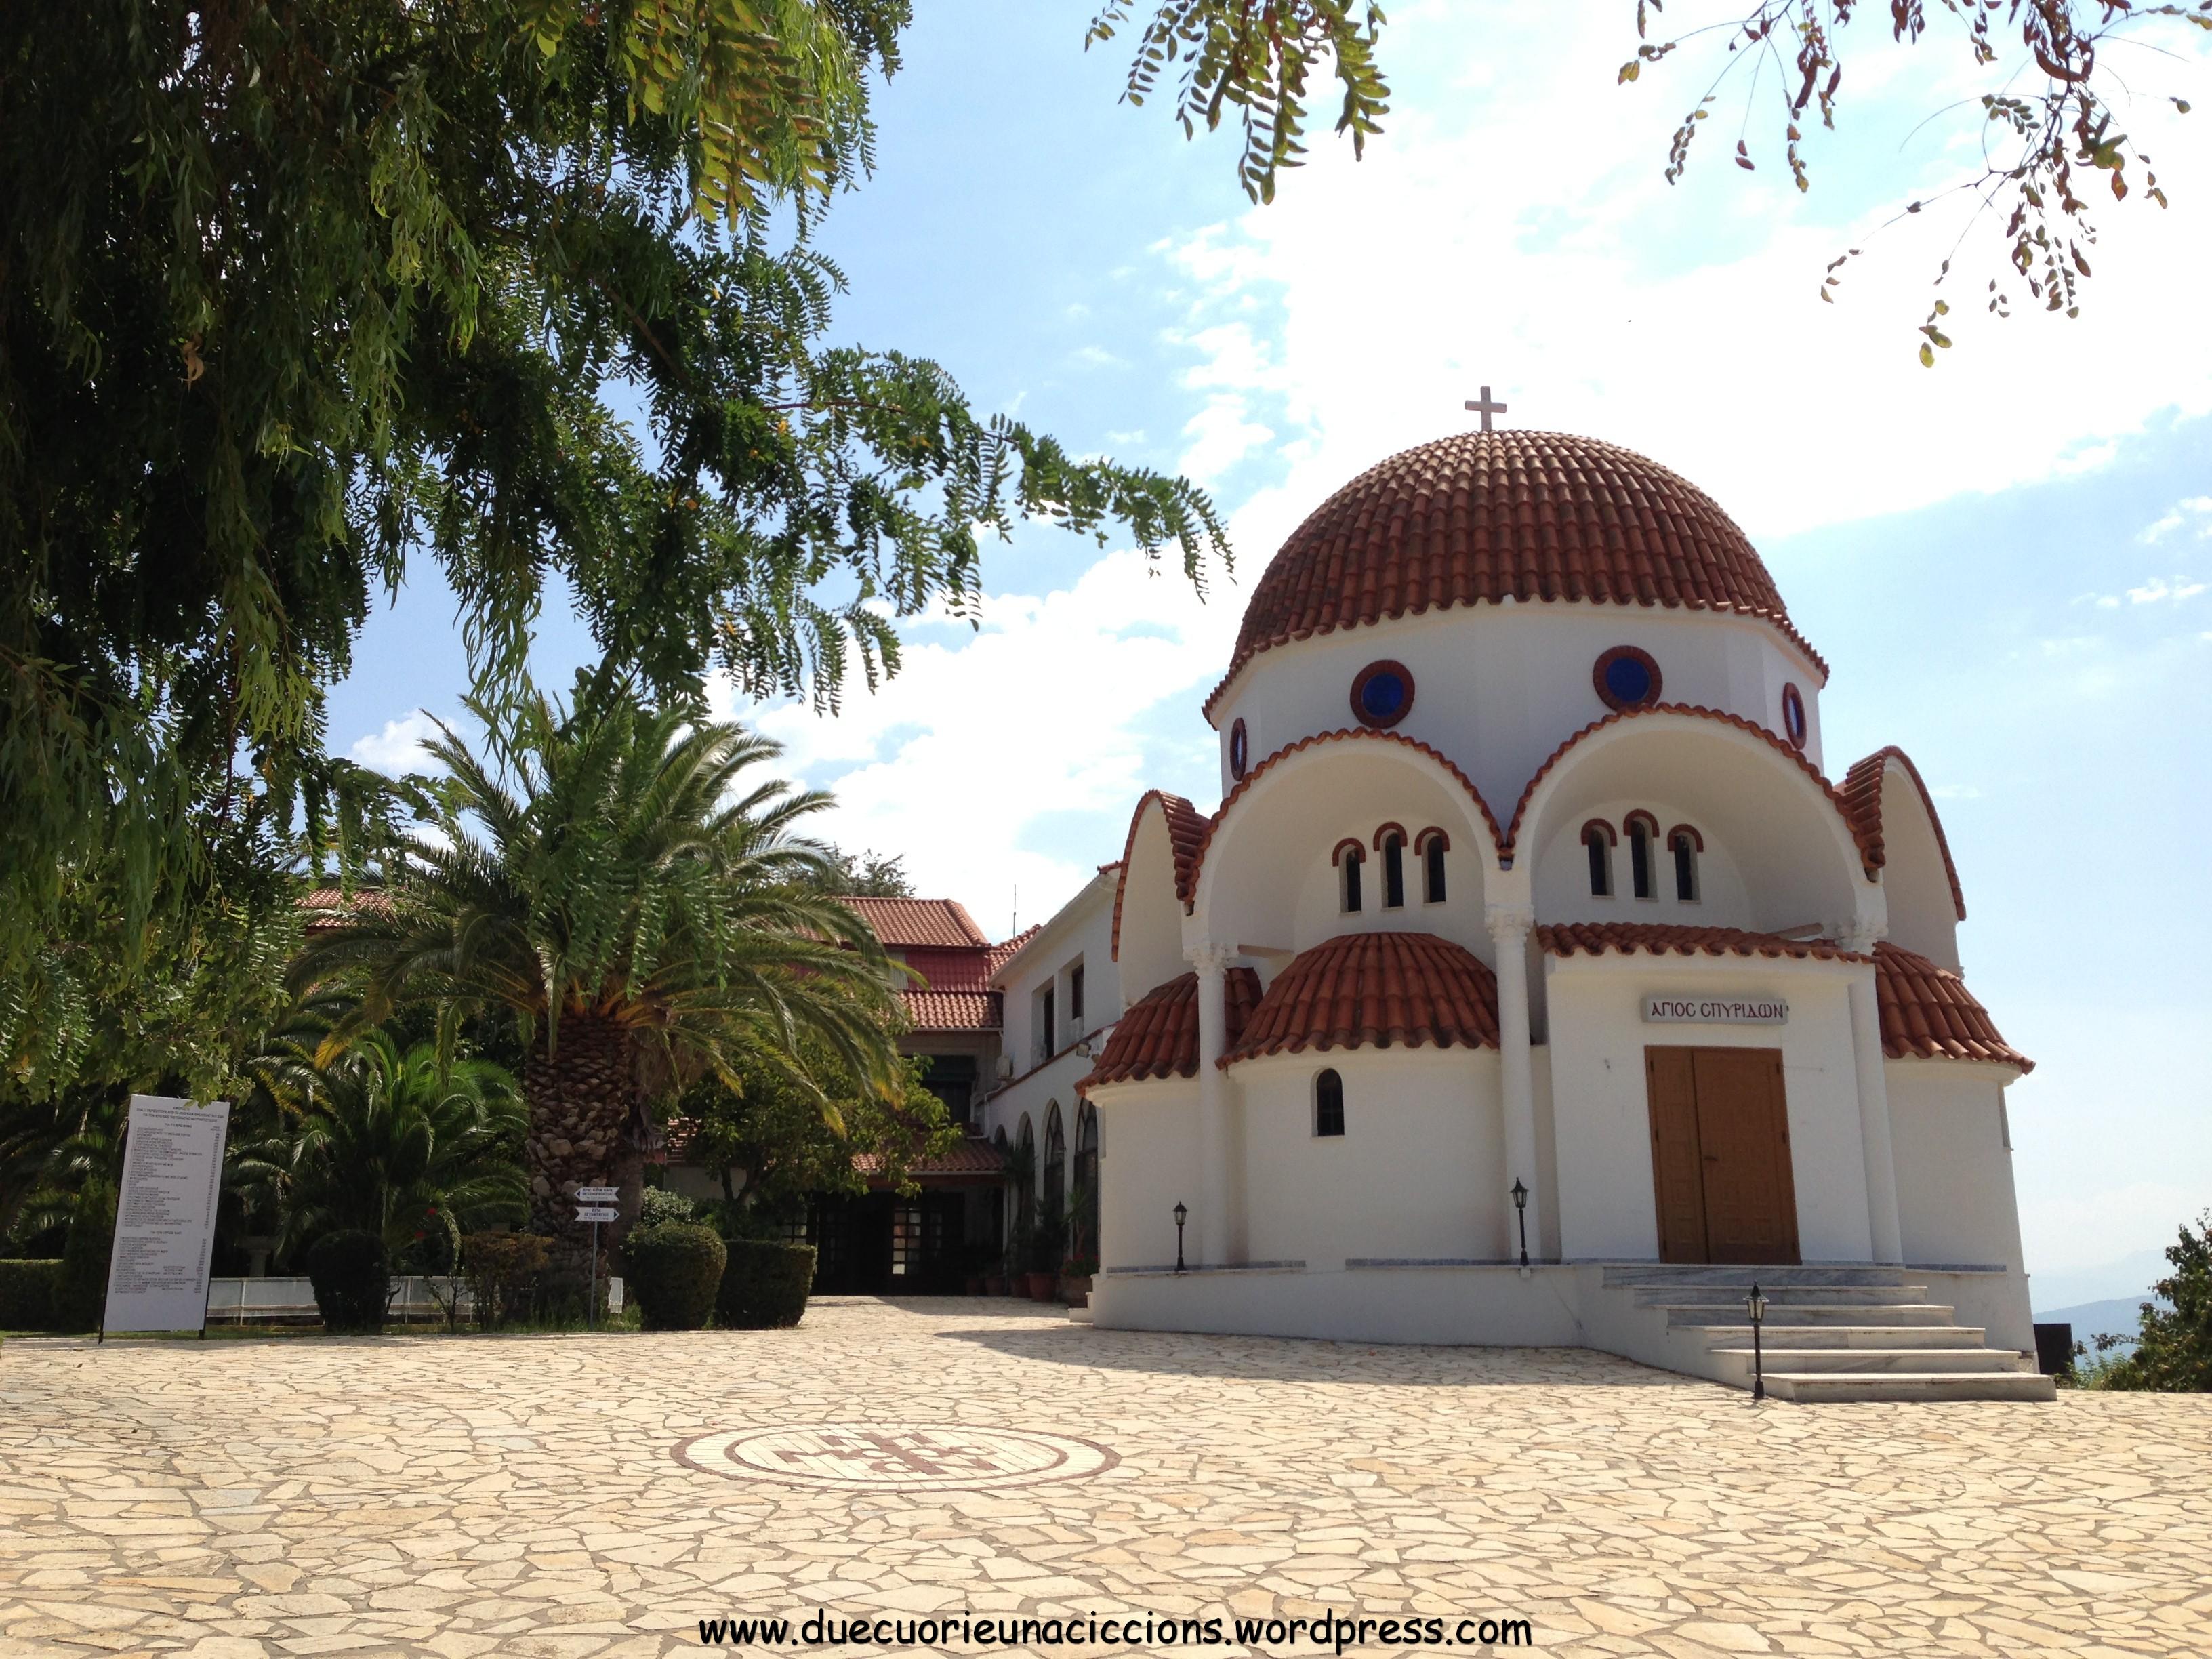 Monastery of the holy metamorphosis